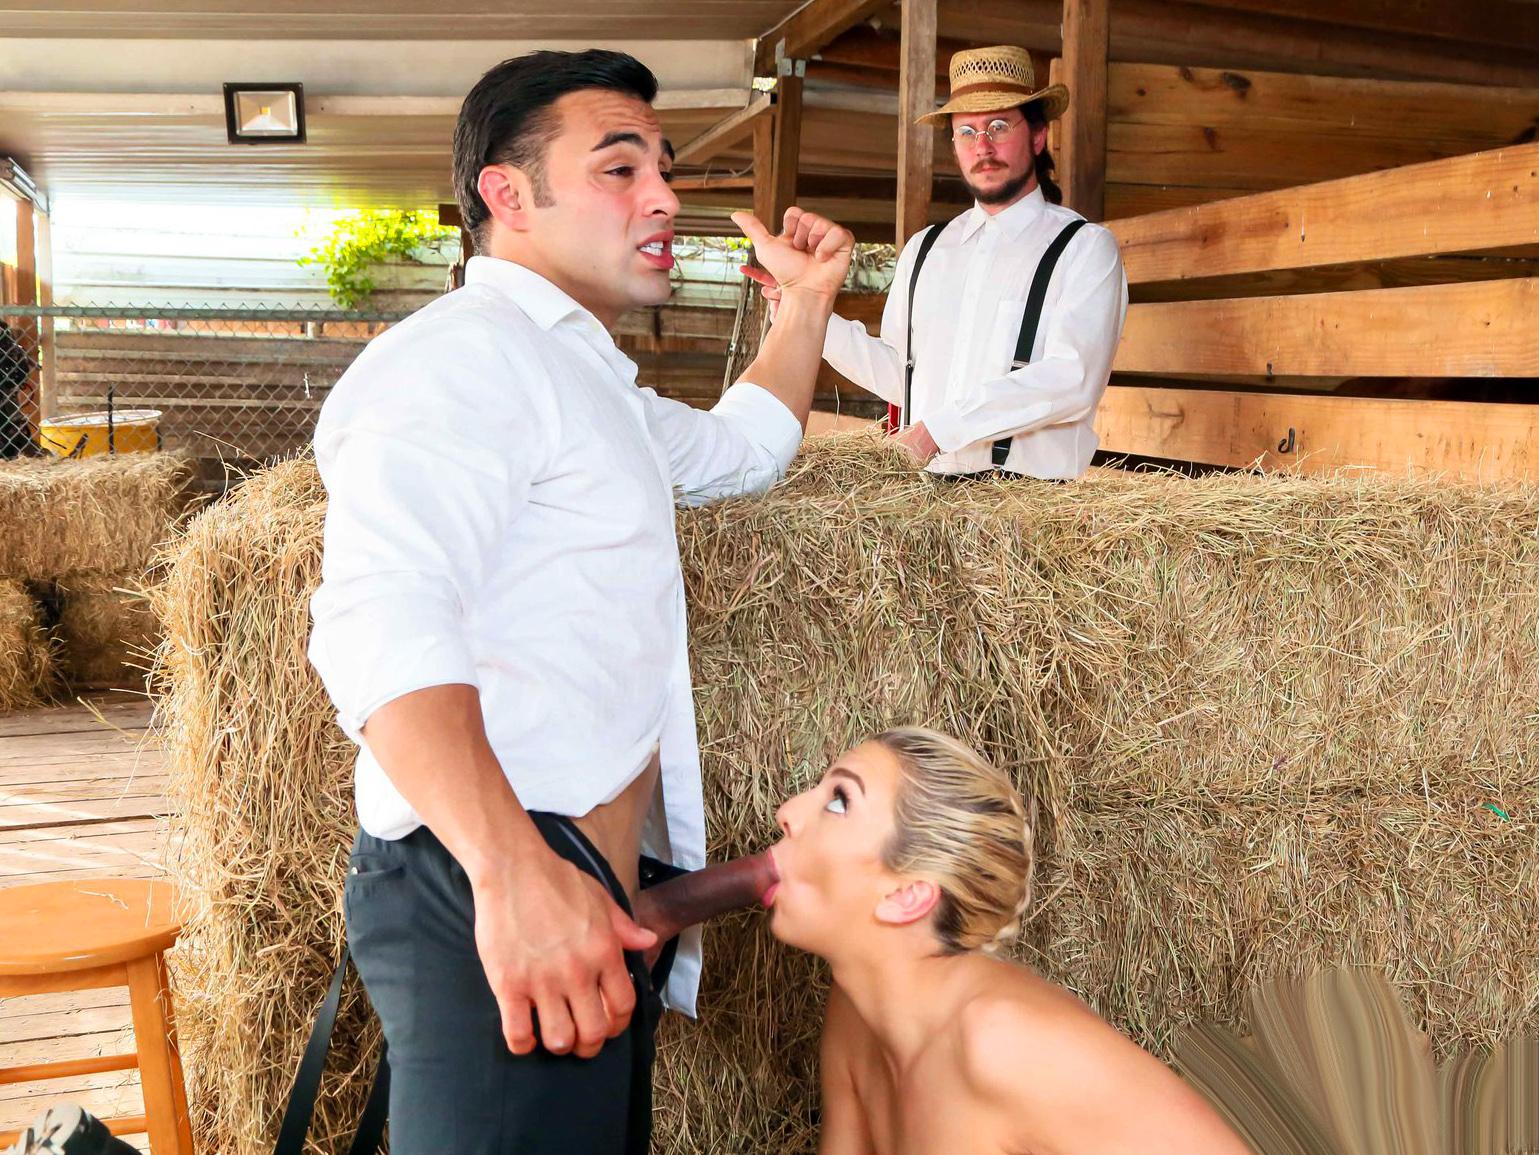 Amish girls go anal